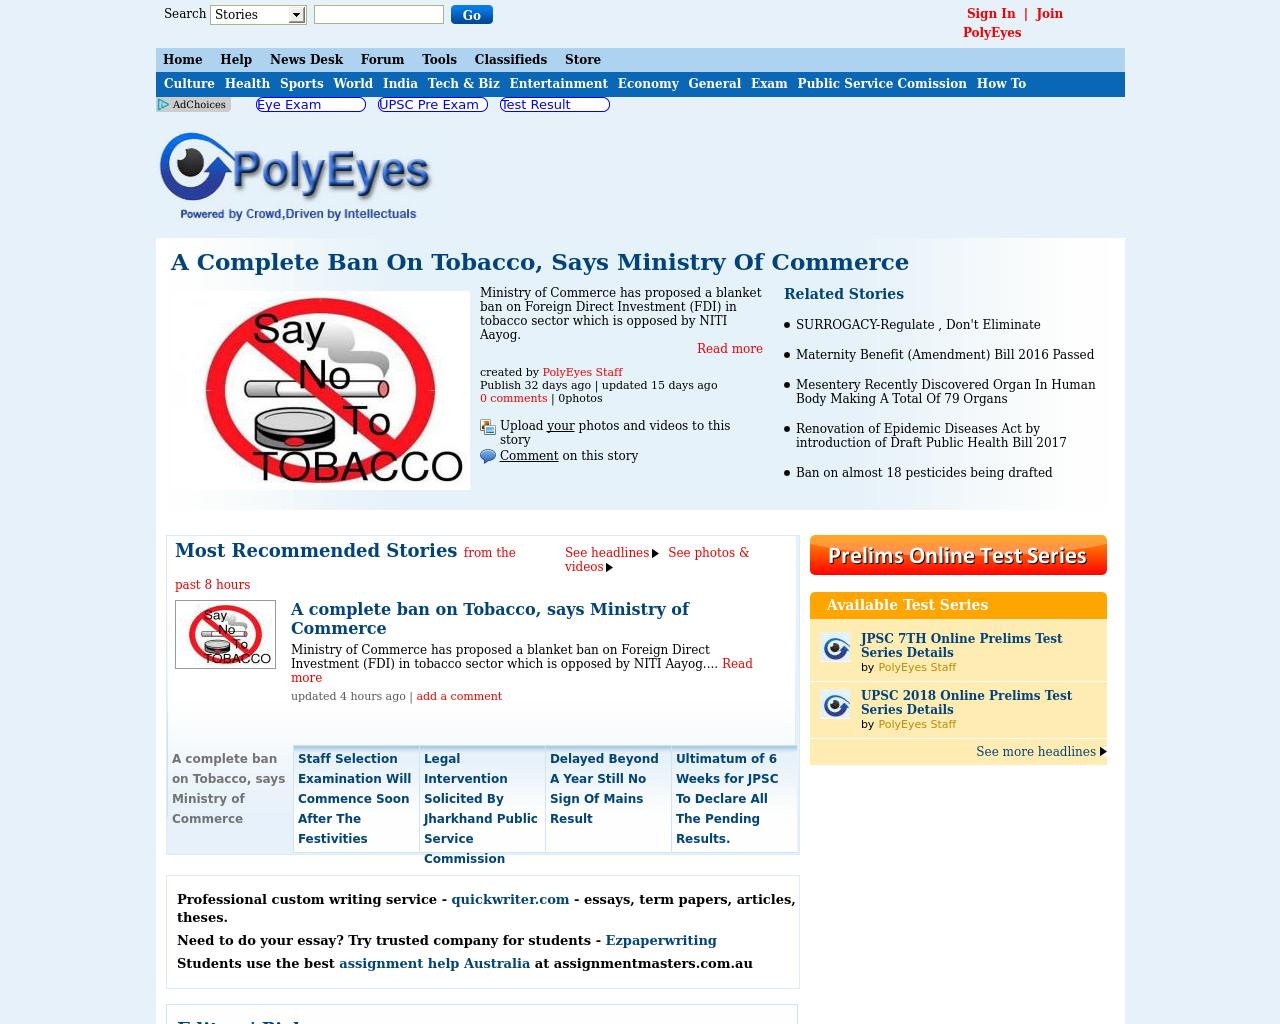 PolyEyes-Advertising-Reviews-Pricing